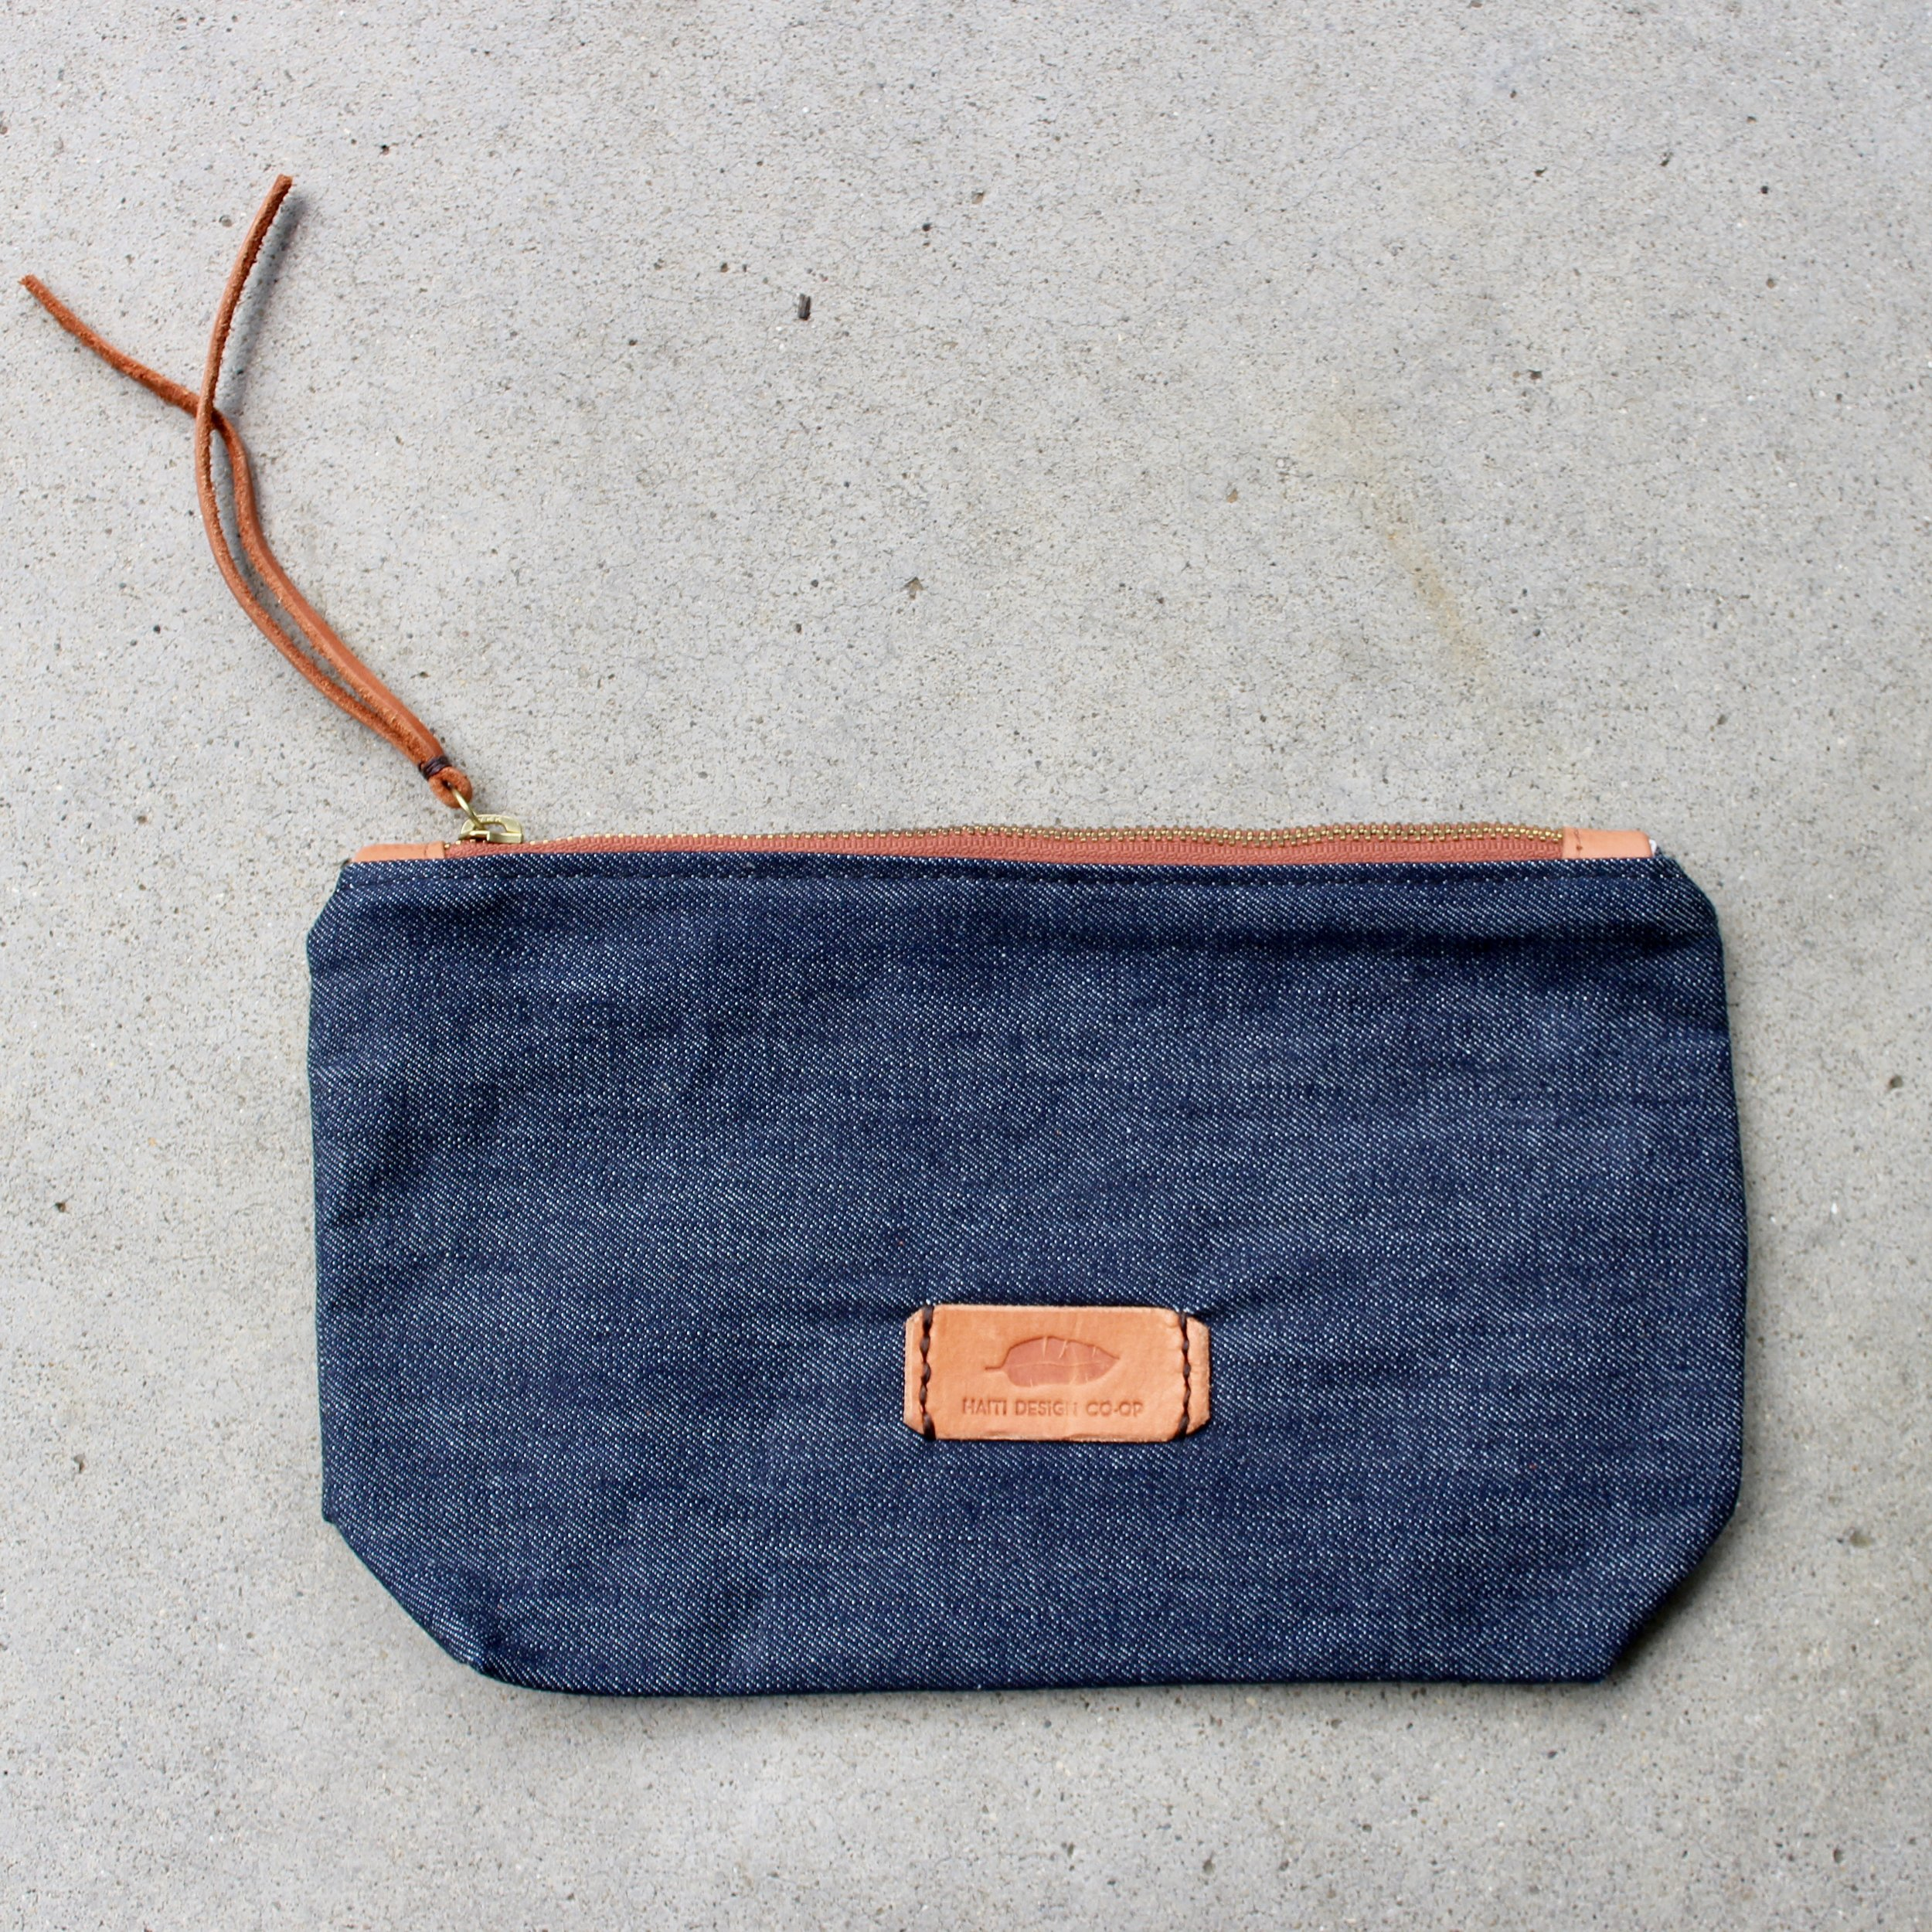 Denim Bag flat lay.jpg